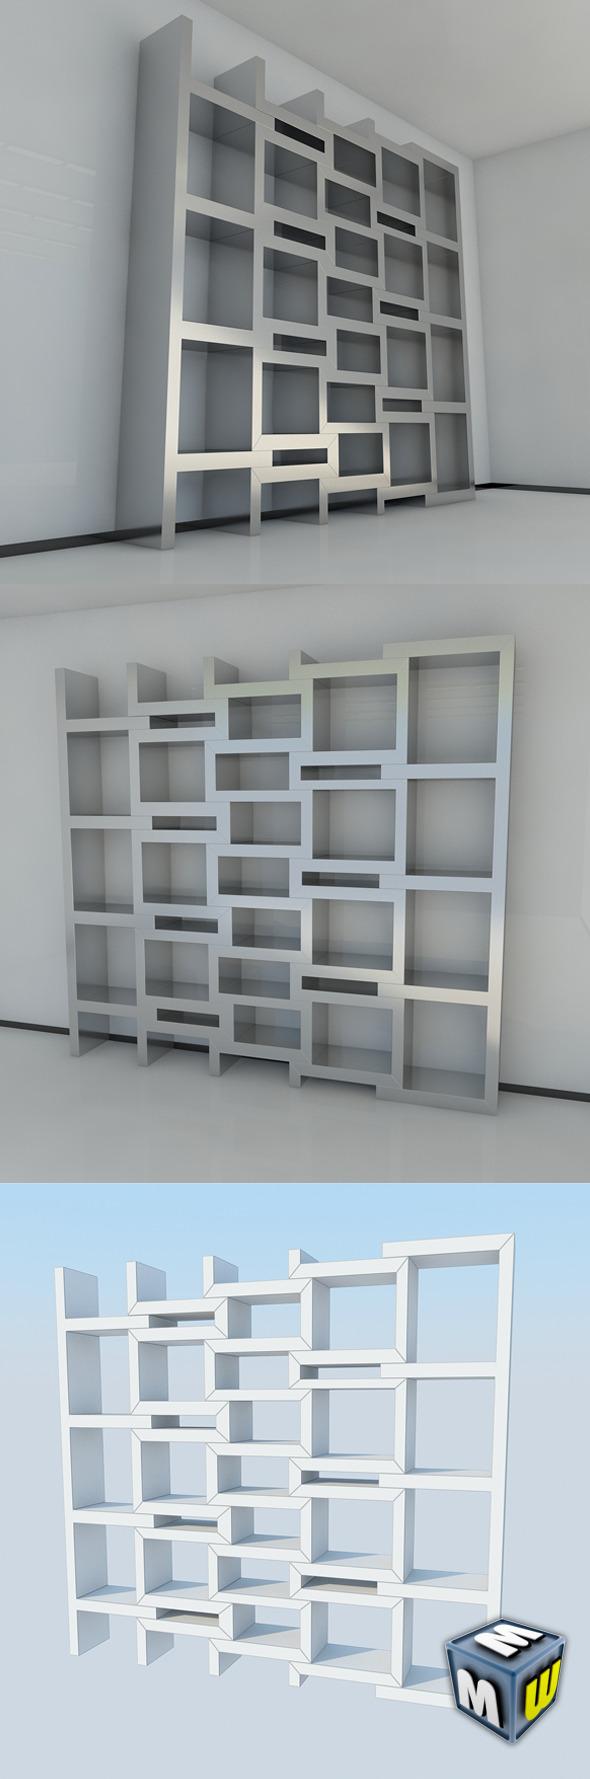 3DOcean Bookshelf 9 MAX 2011 5004313